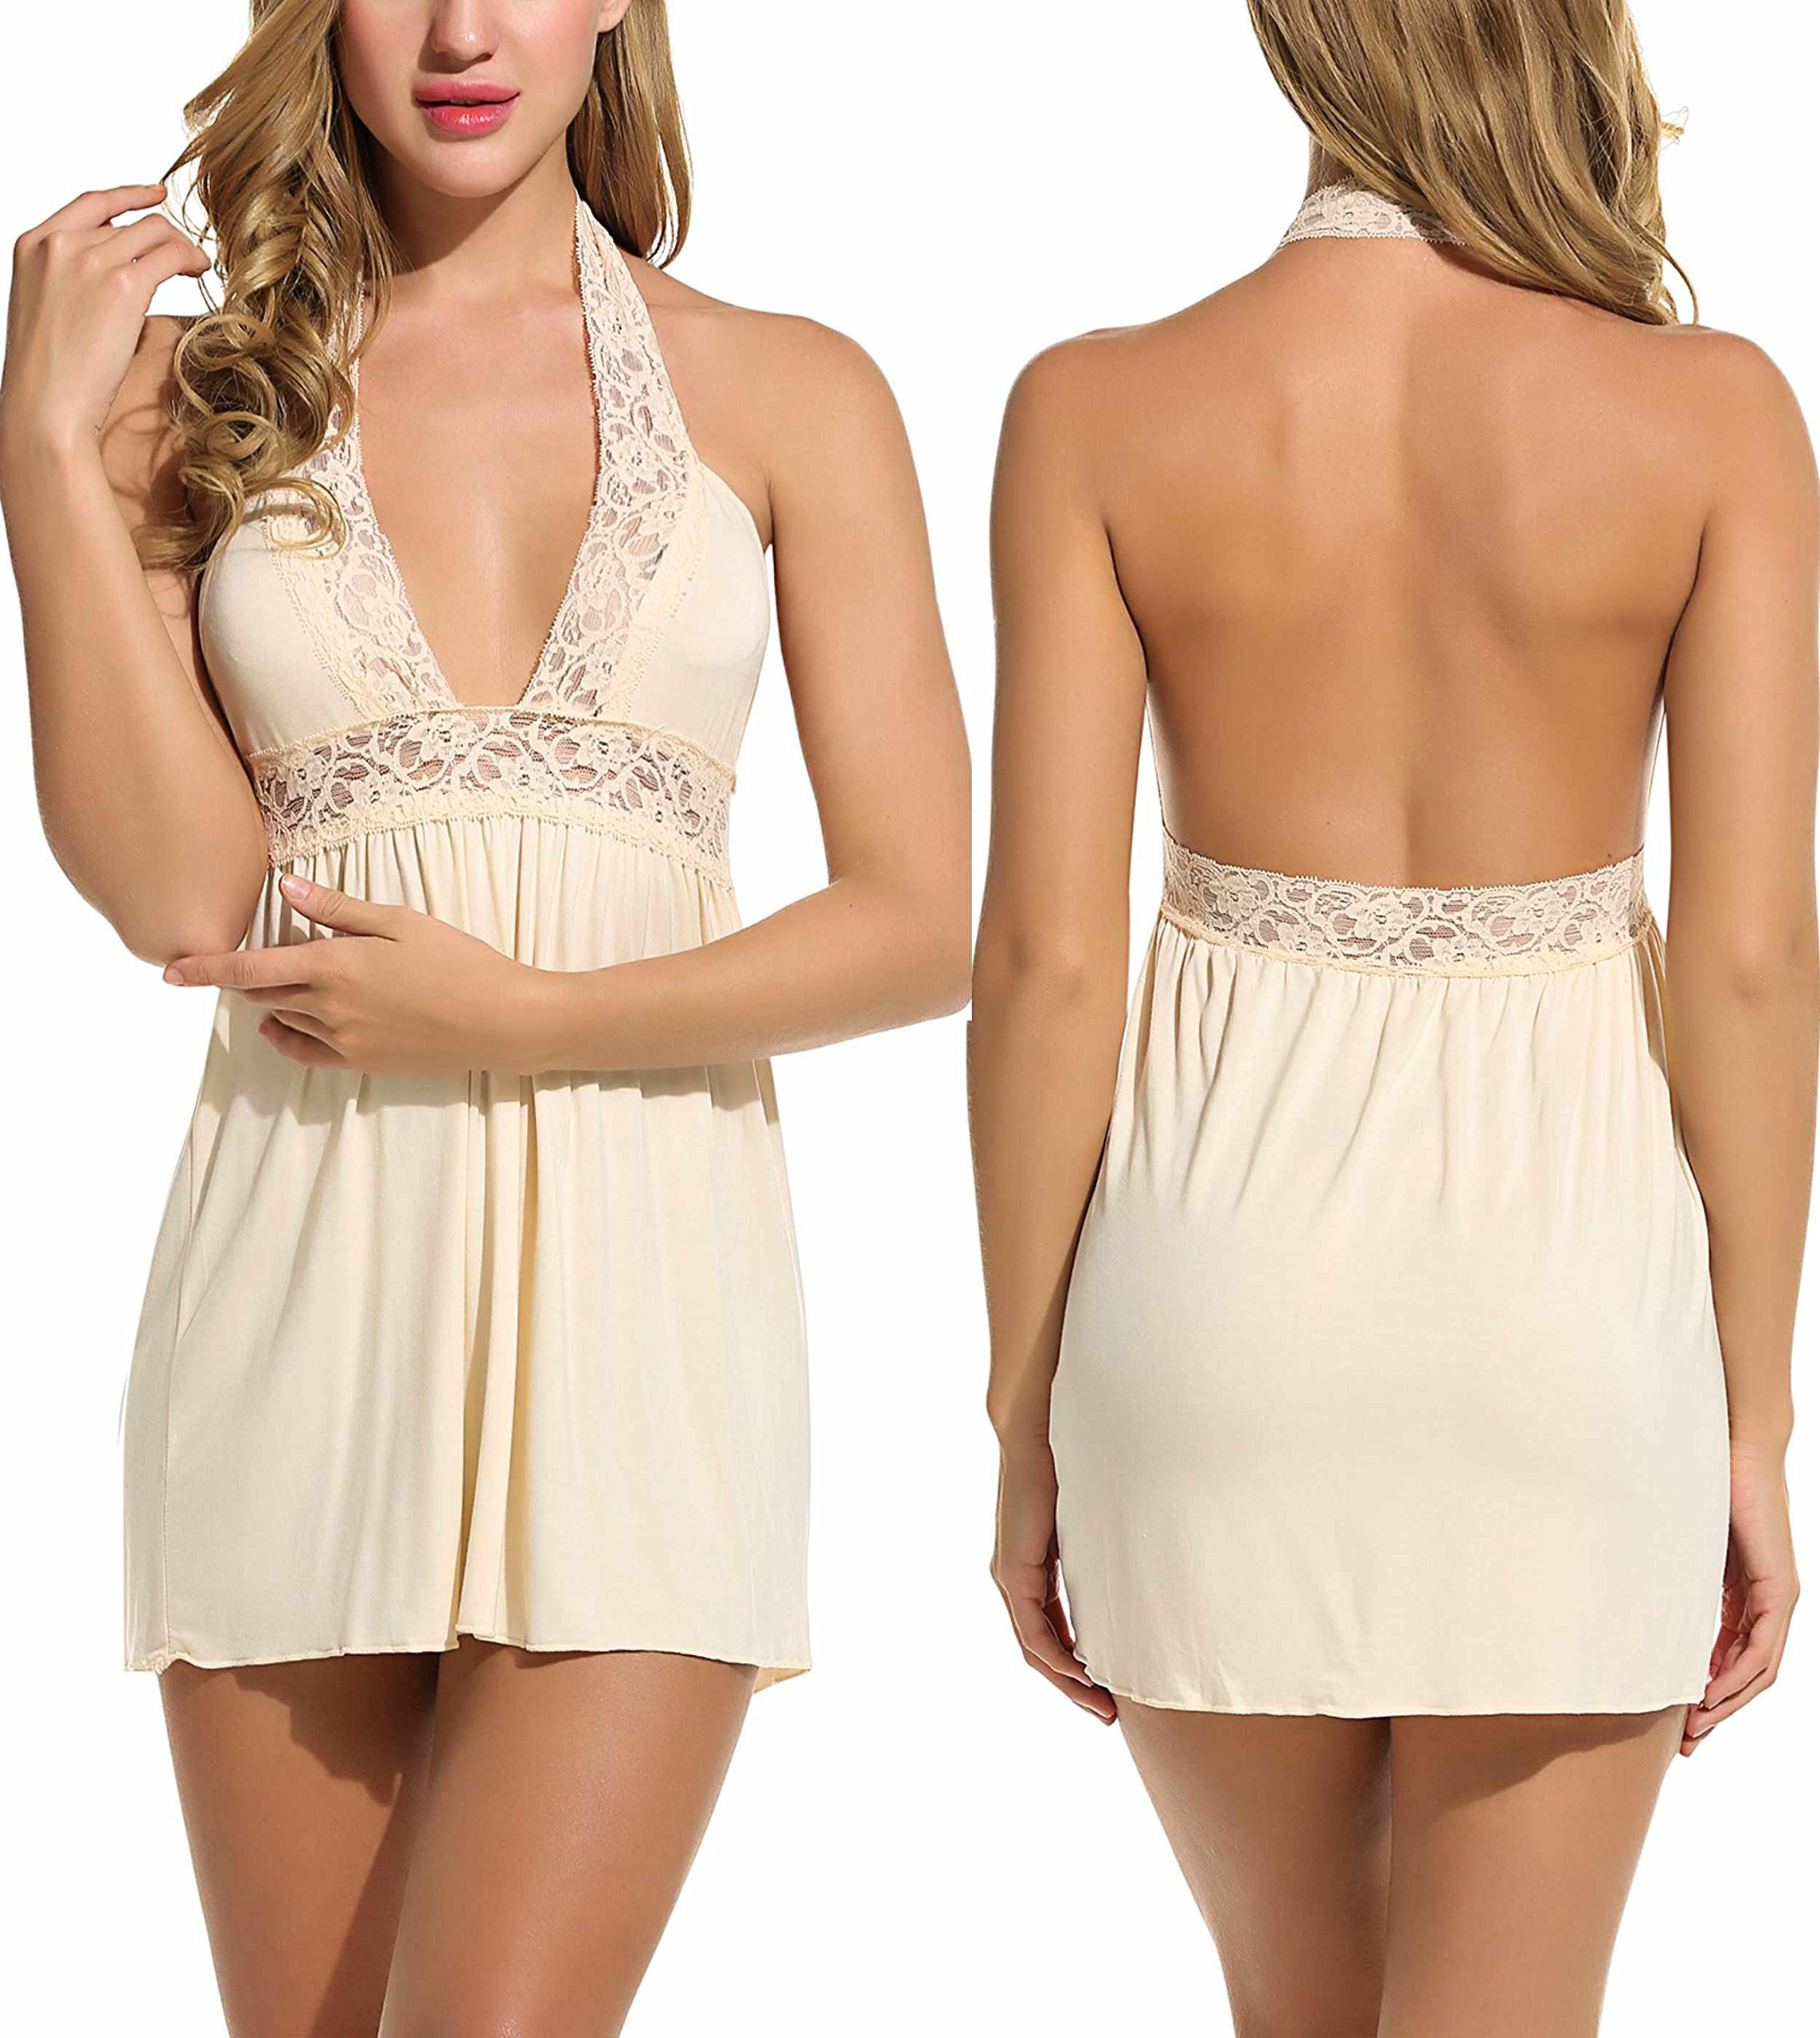 Adoeve Womens Sleepwear Satin Lace Babydoll Sets